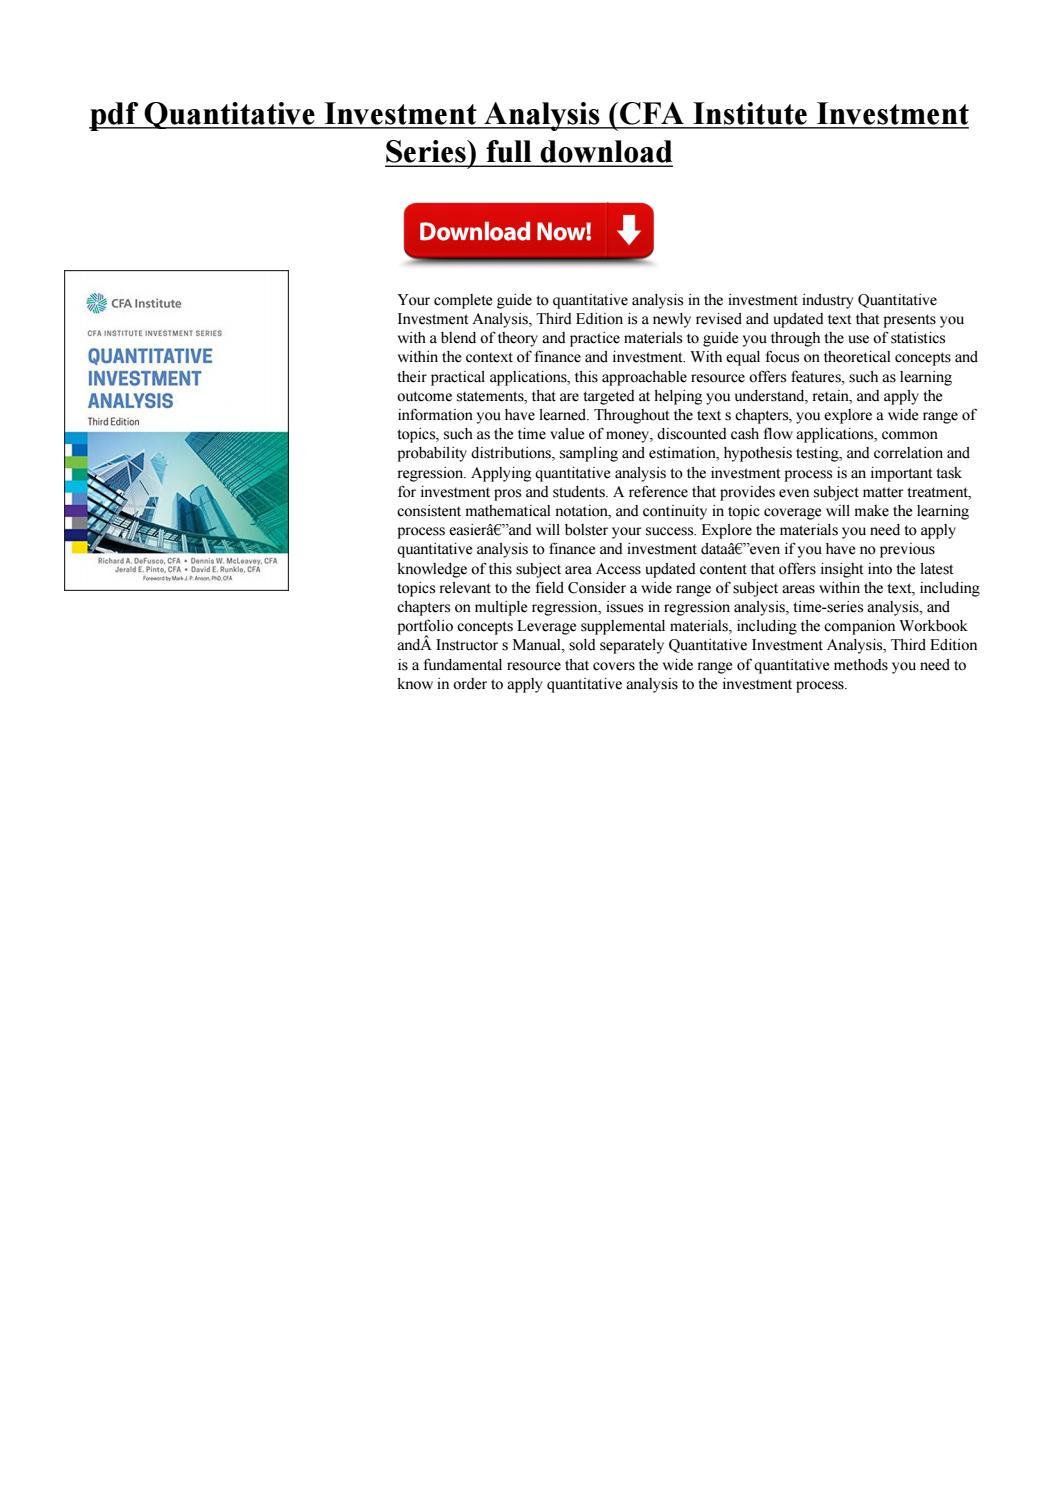 Workbooks cfa workbook : Quantitative investment by gustijepsu - issuu